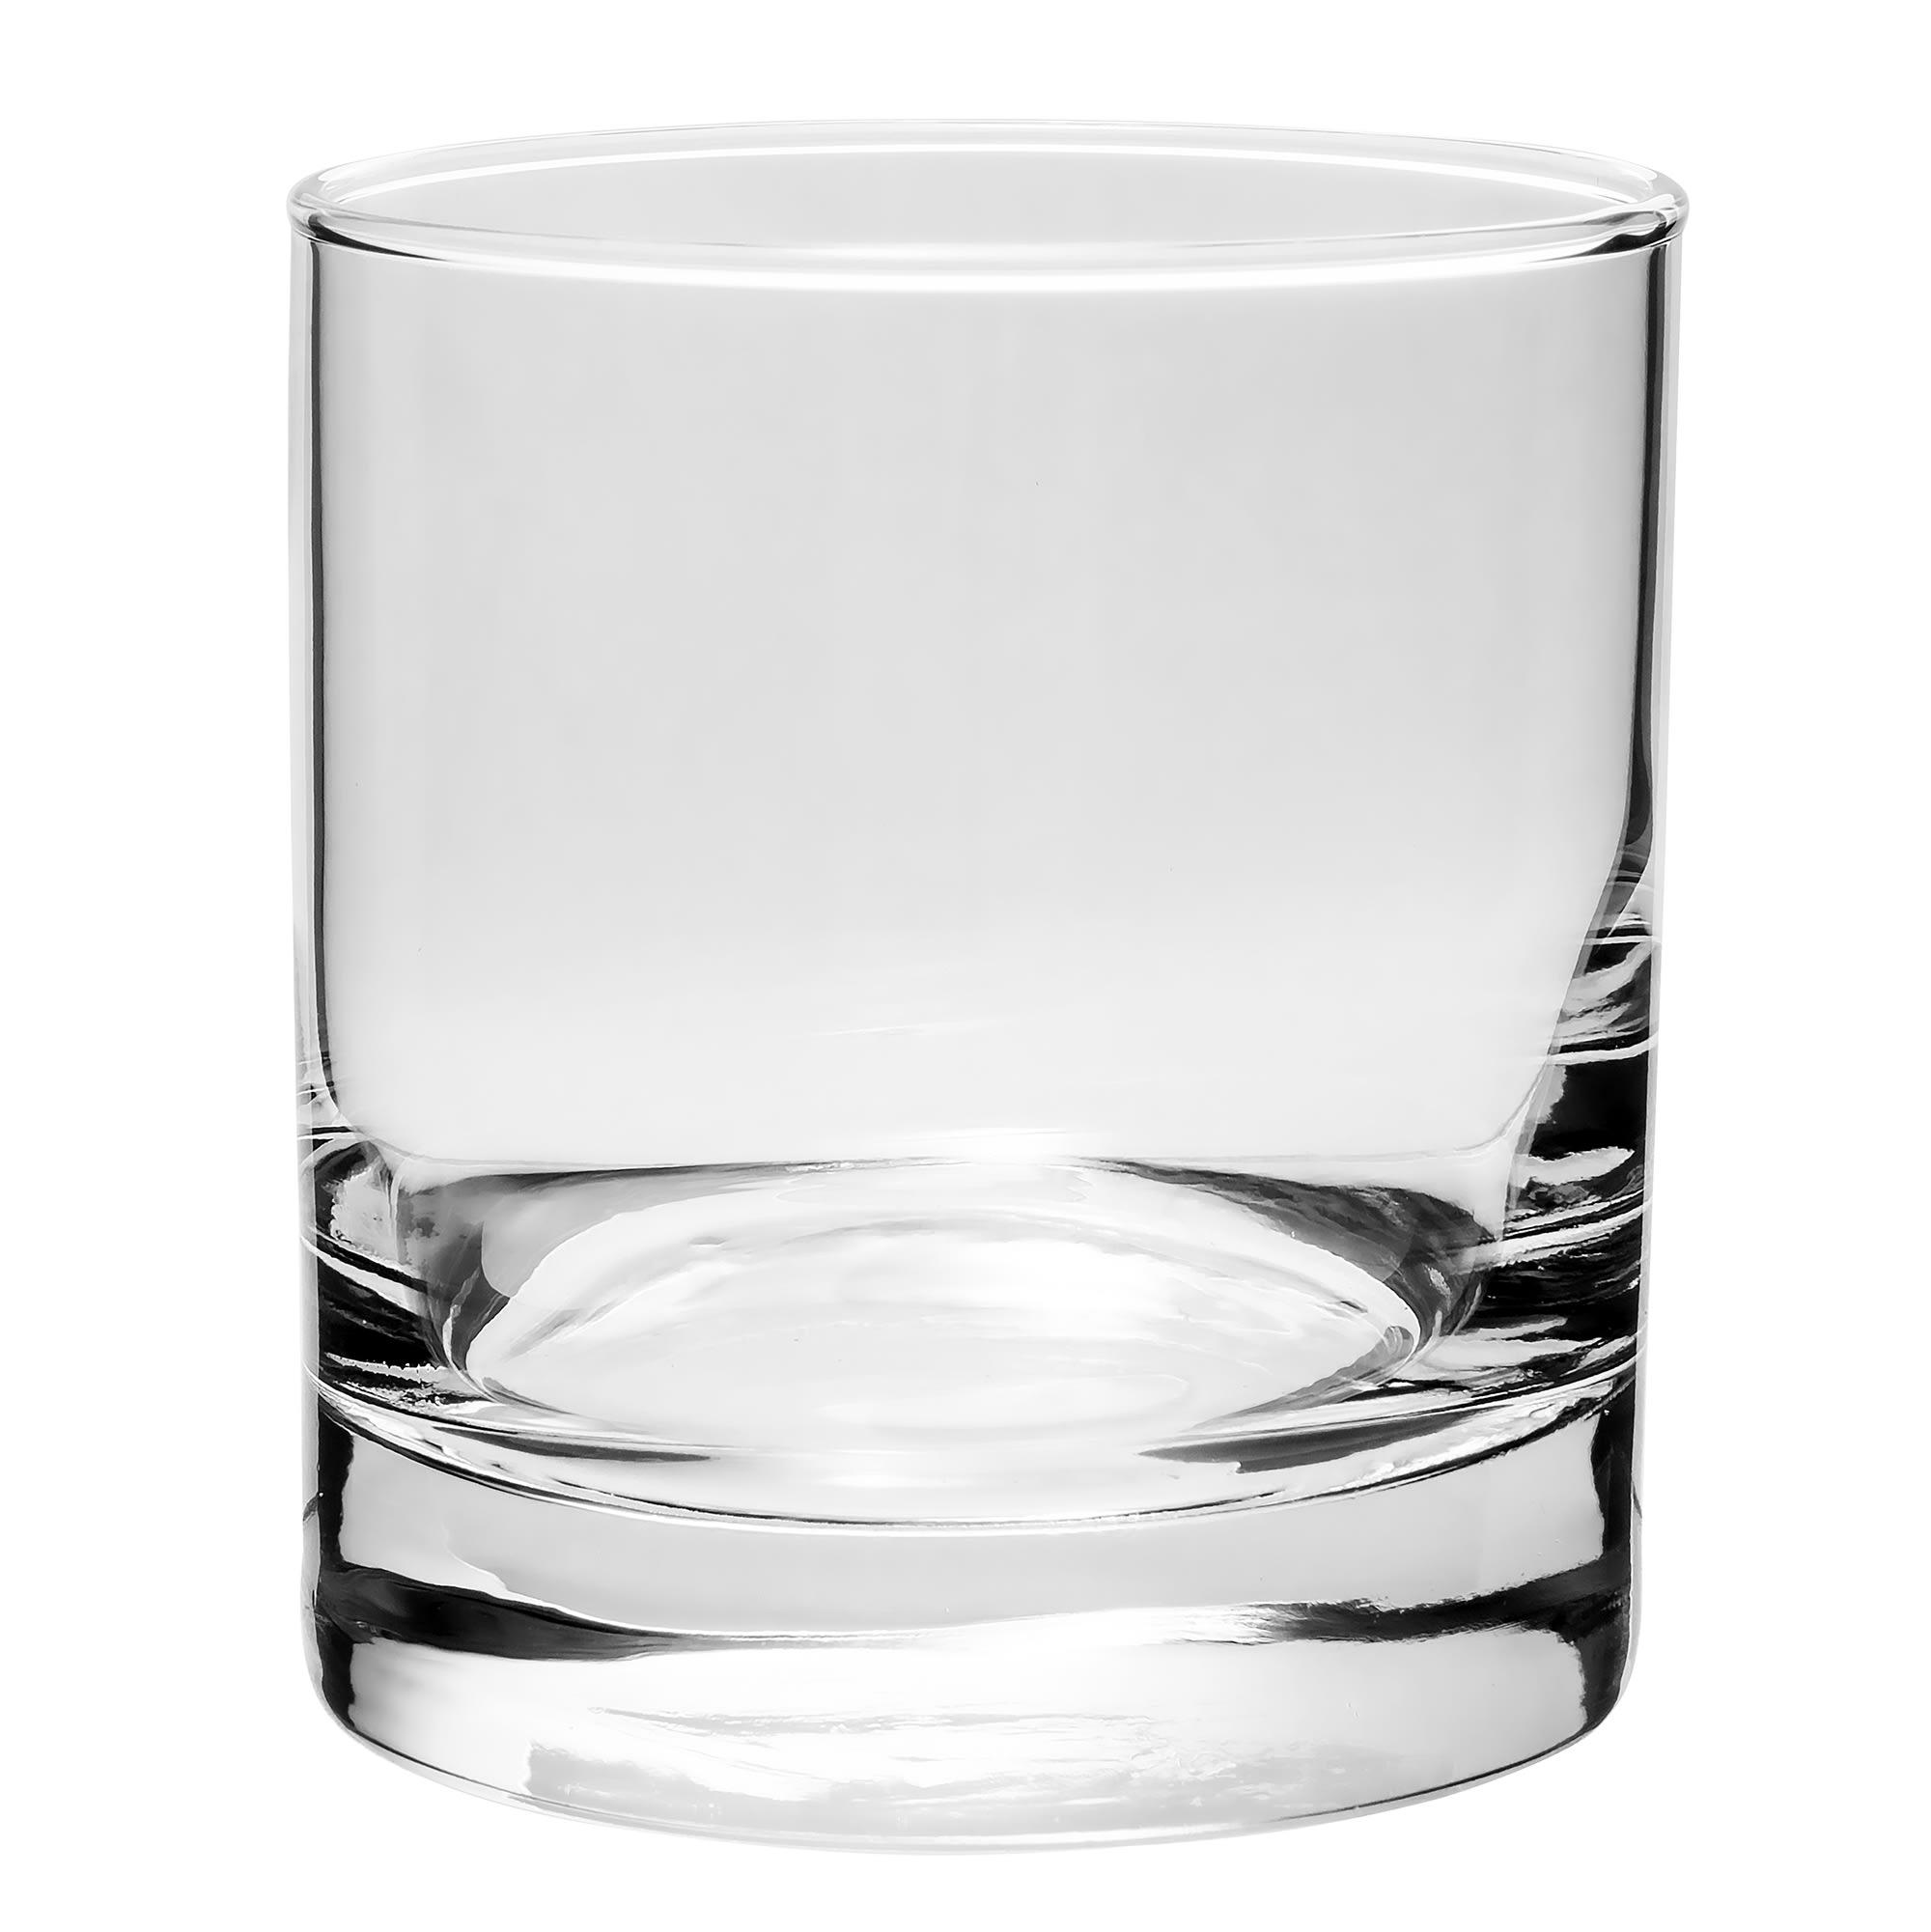 Libbey 916CD 8-oz Heavy Base Rocks Glass - Finedge